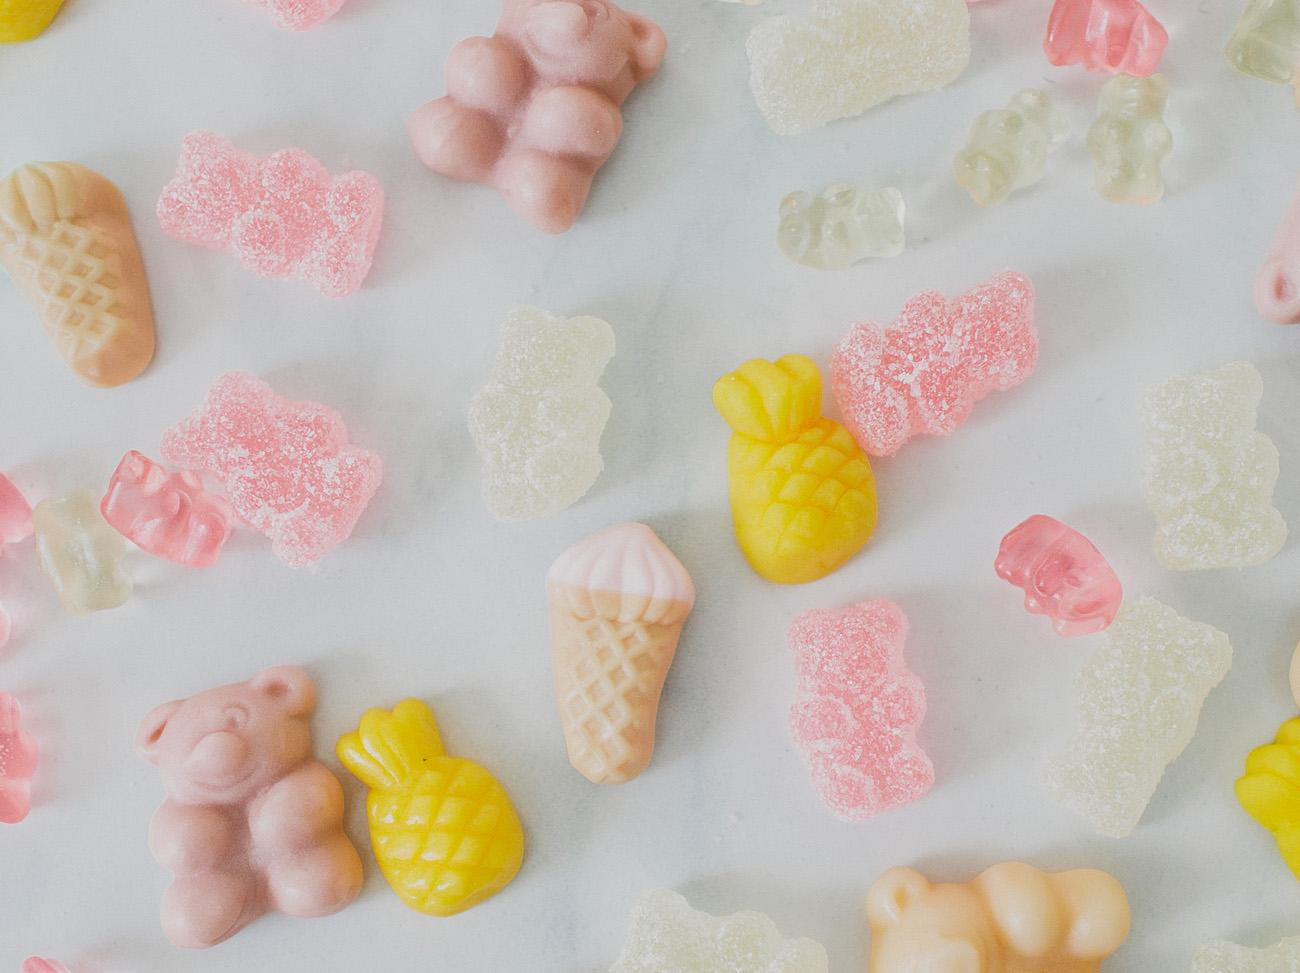 Sugarfina Candies